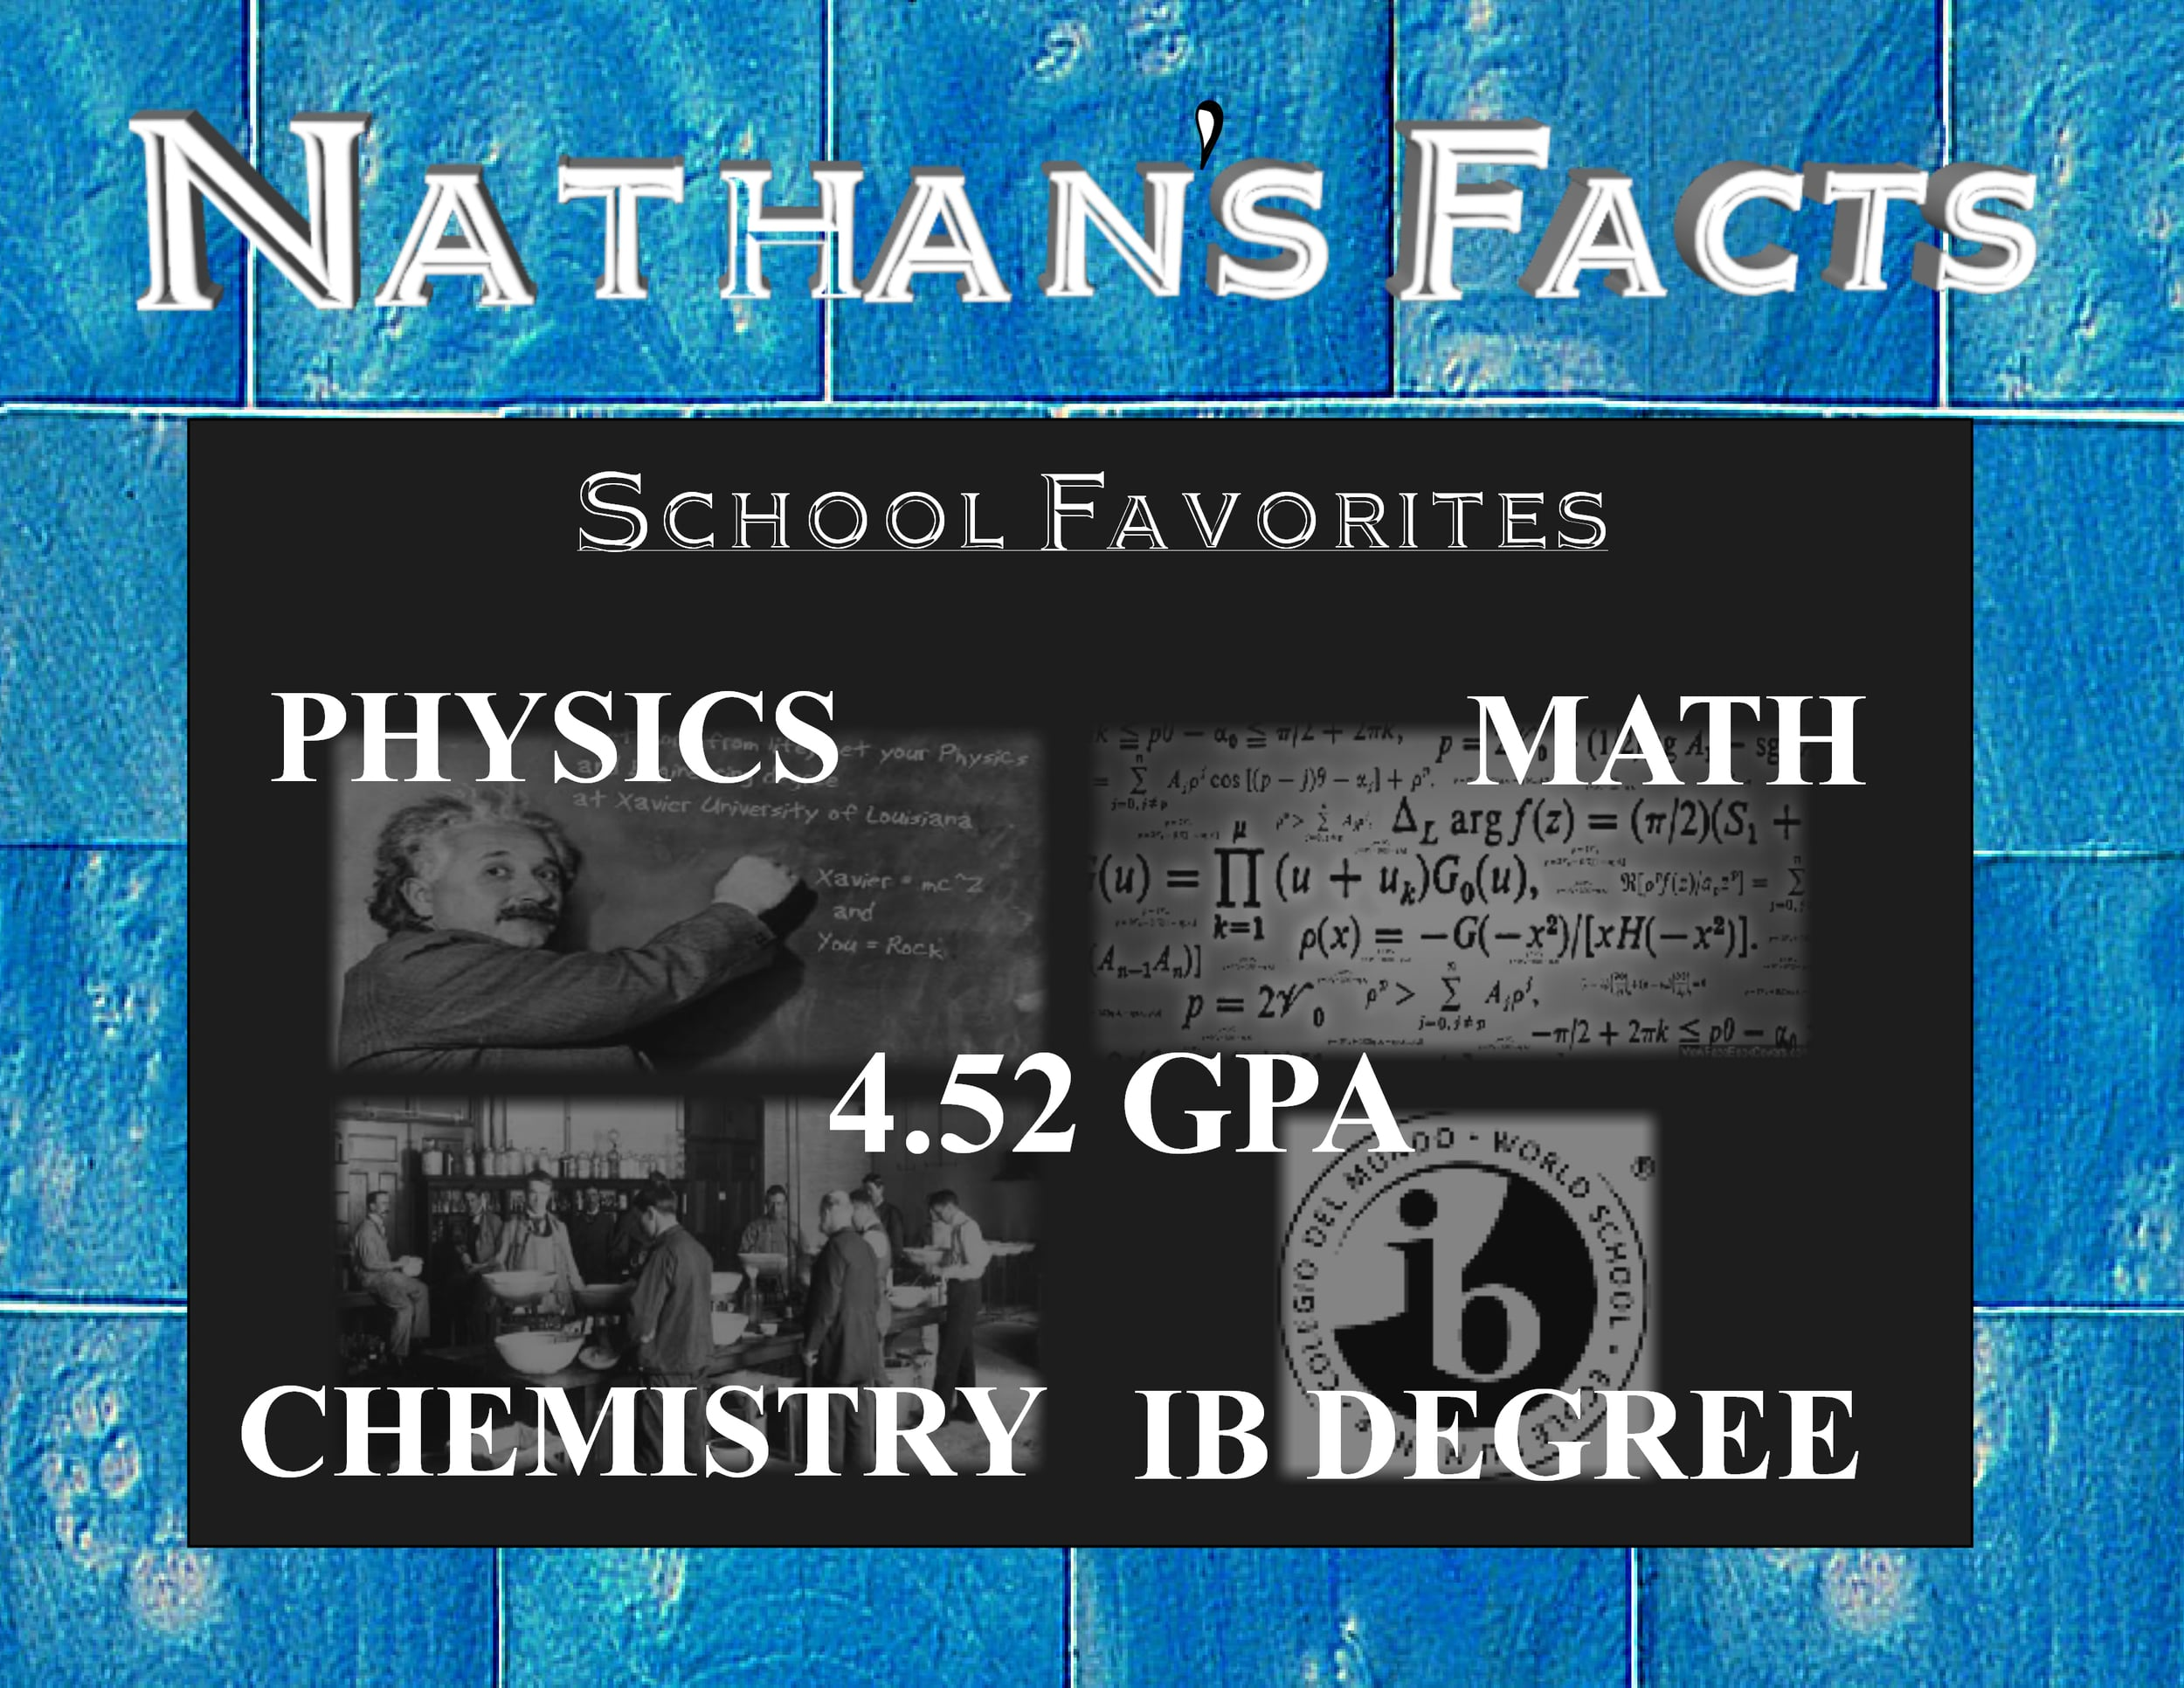 Nathans Facts School.JPG